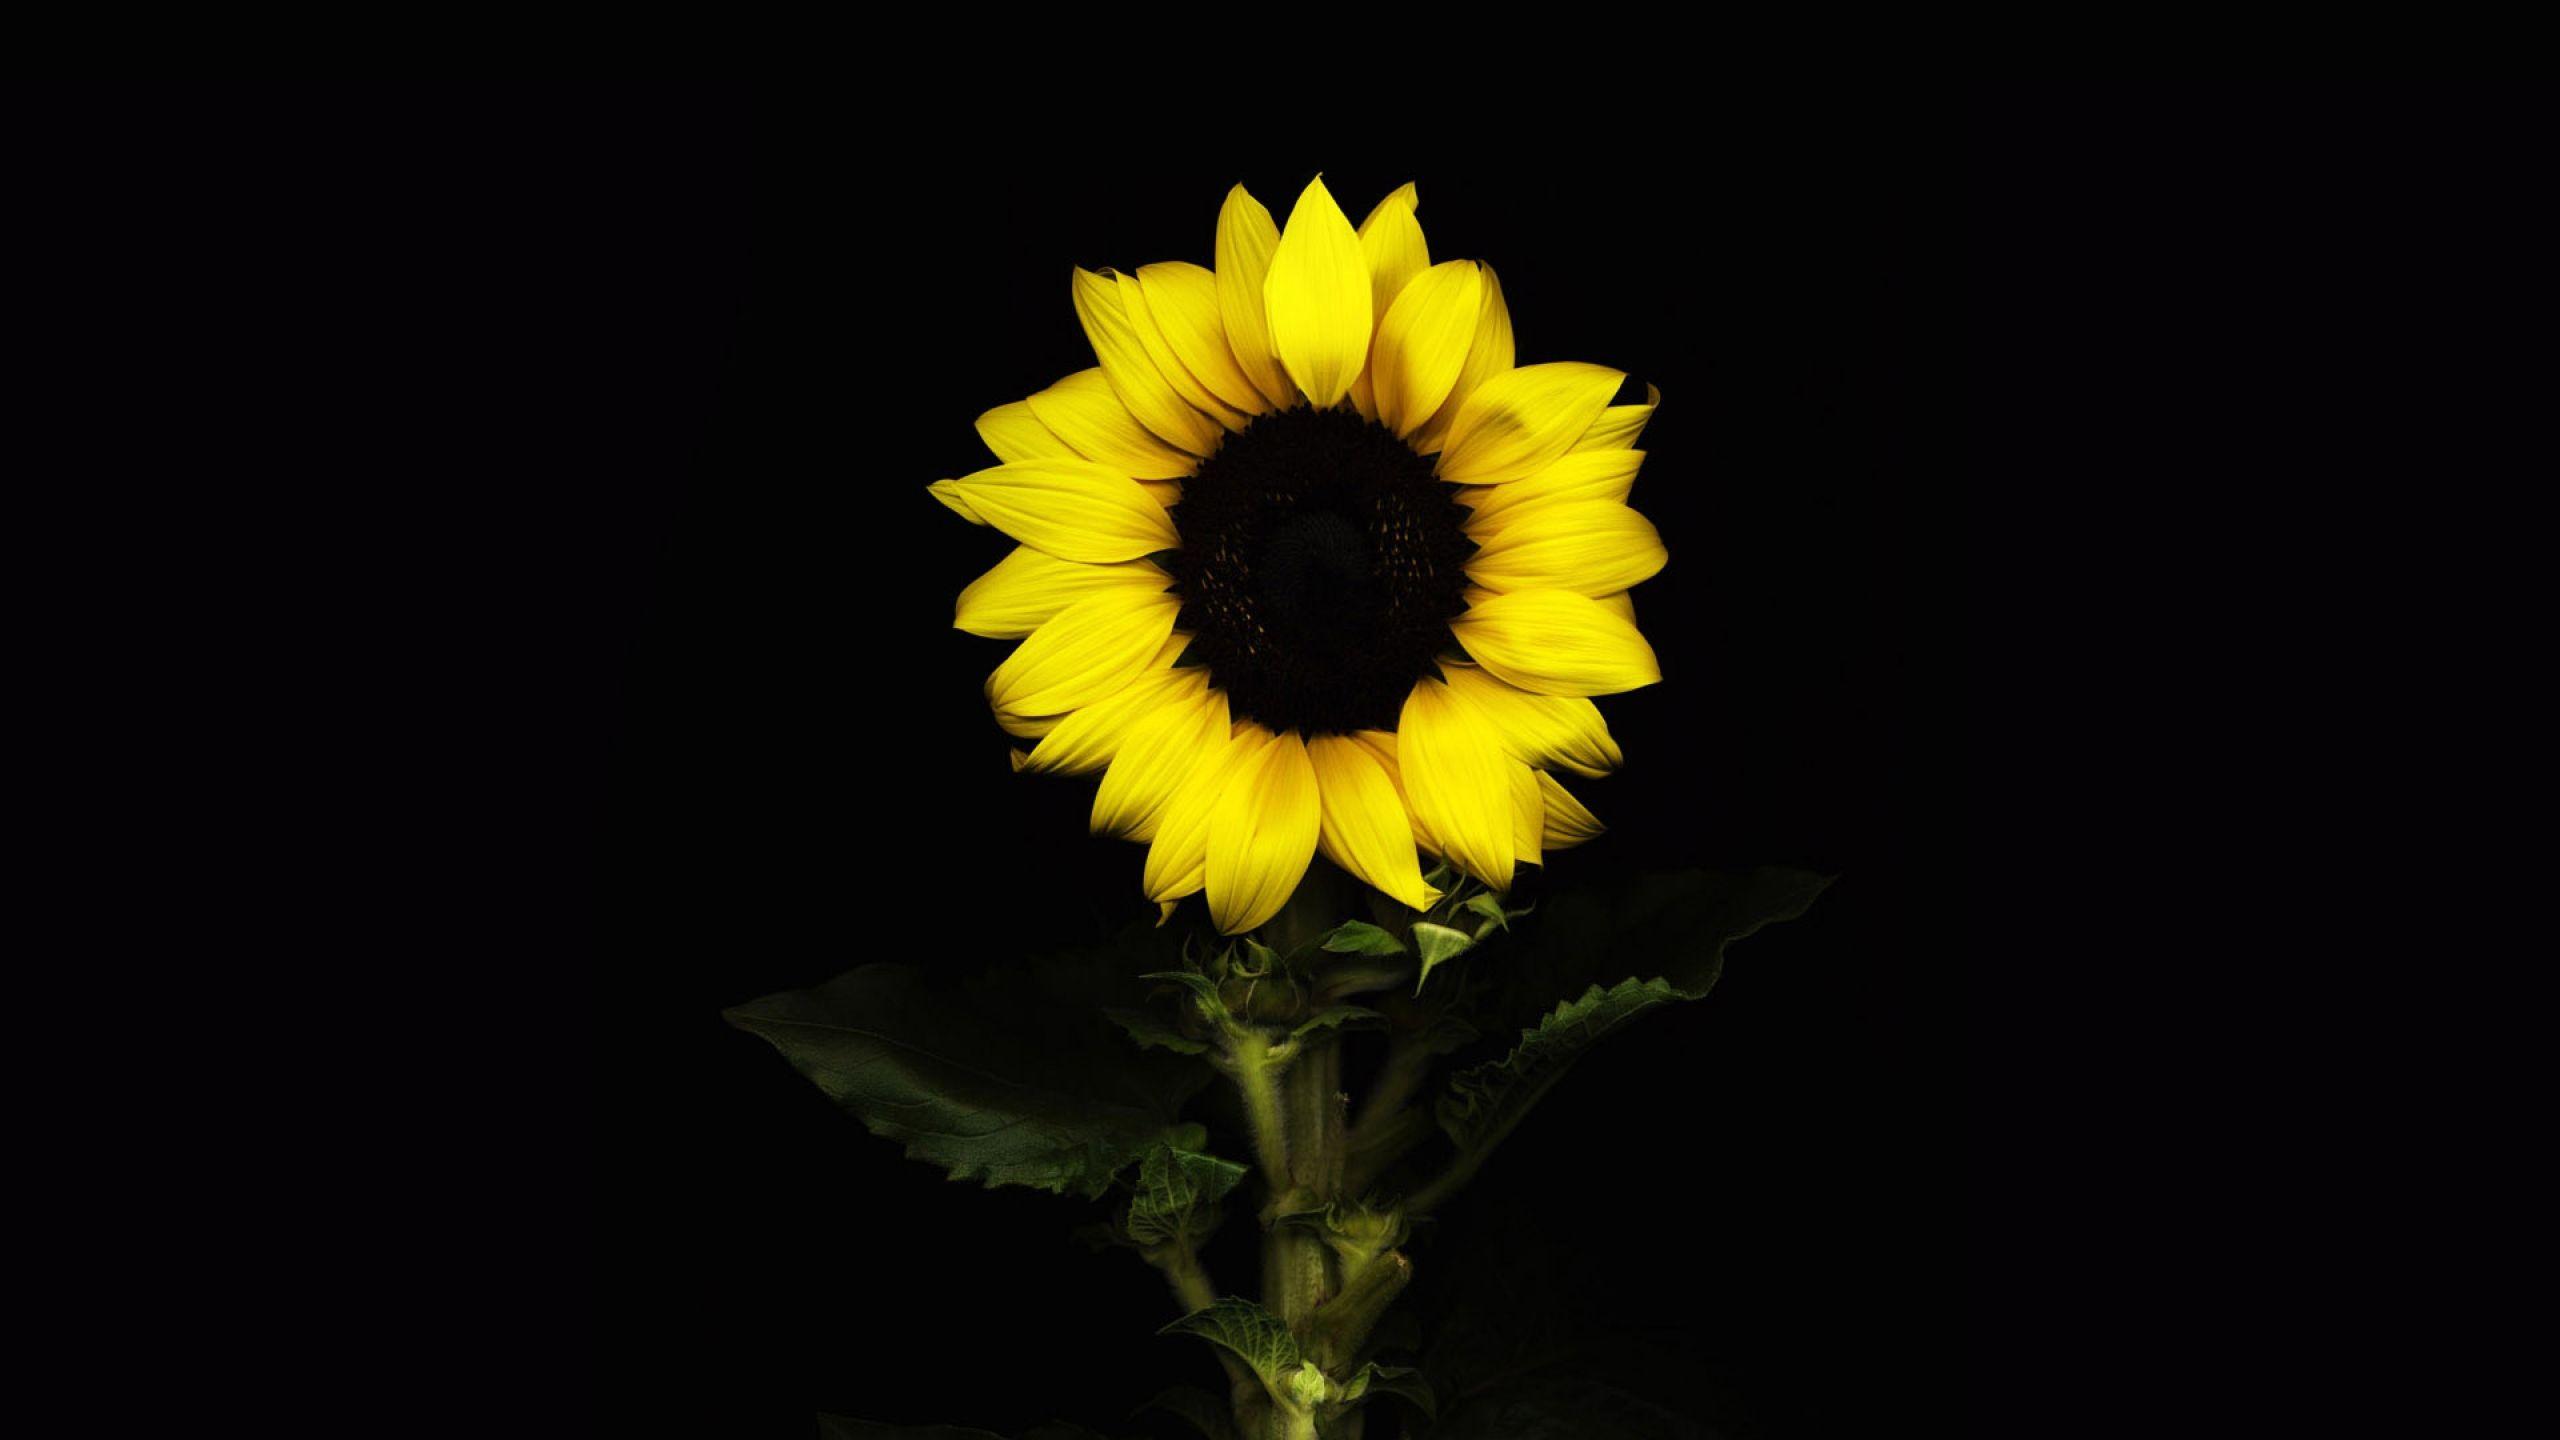 Fondo De Pantalla Girasol, Con La Flor, Fondo Negro, Flor